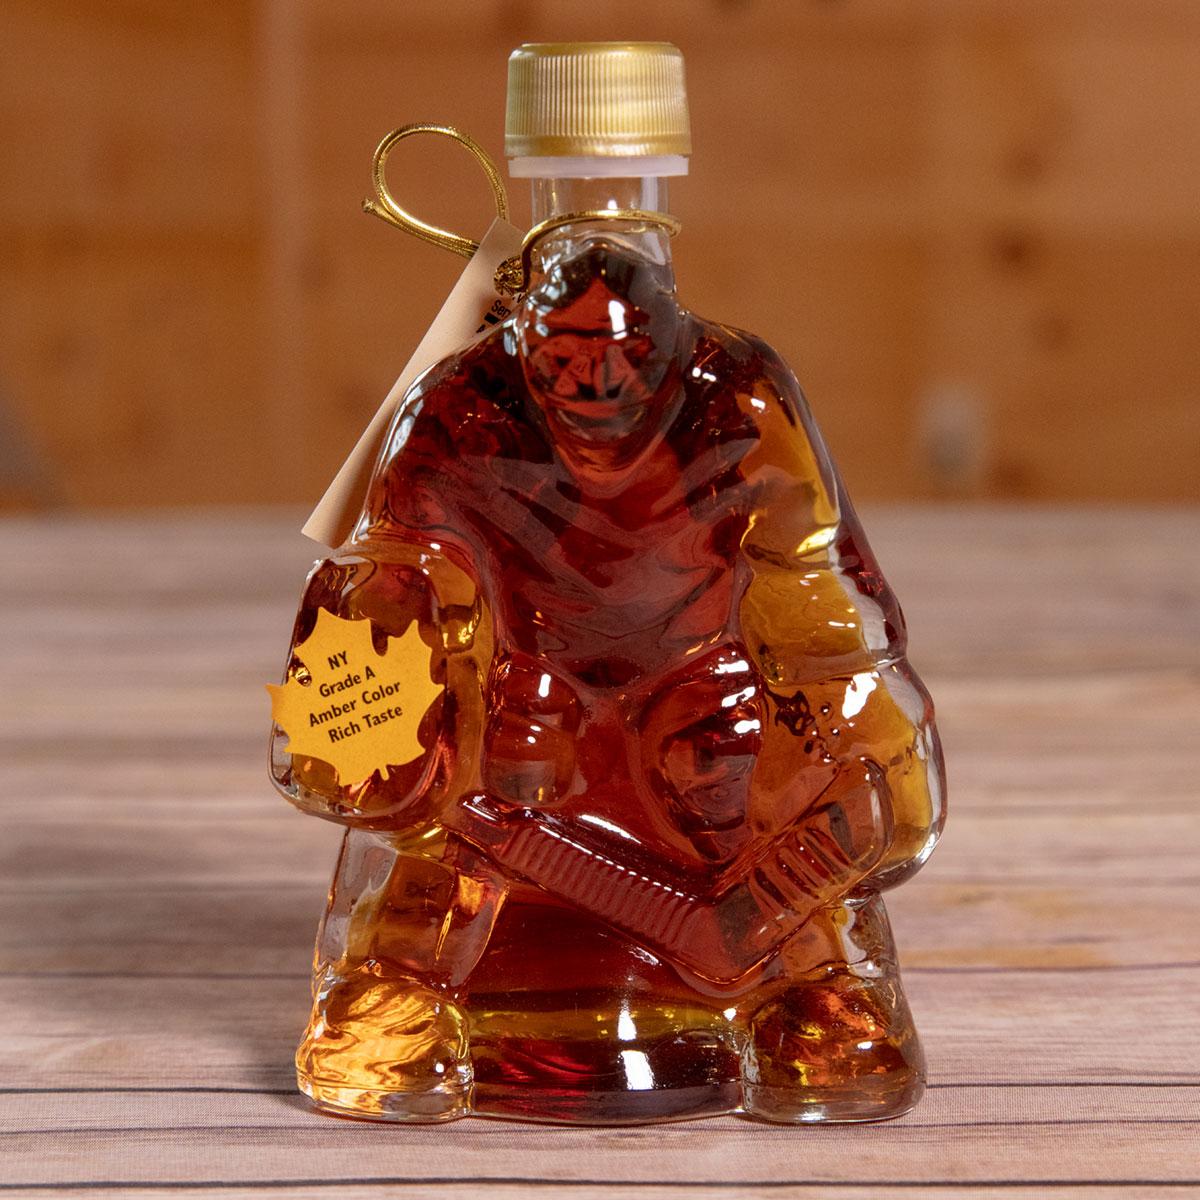 Bechard's PURE Maple Syrup Decorative Glass Jar 6.8 oz - Hockey Goalie